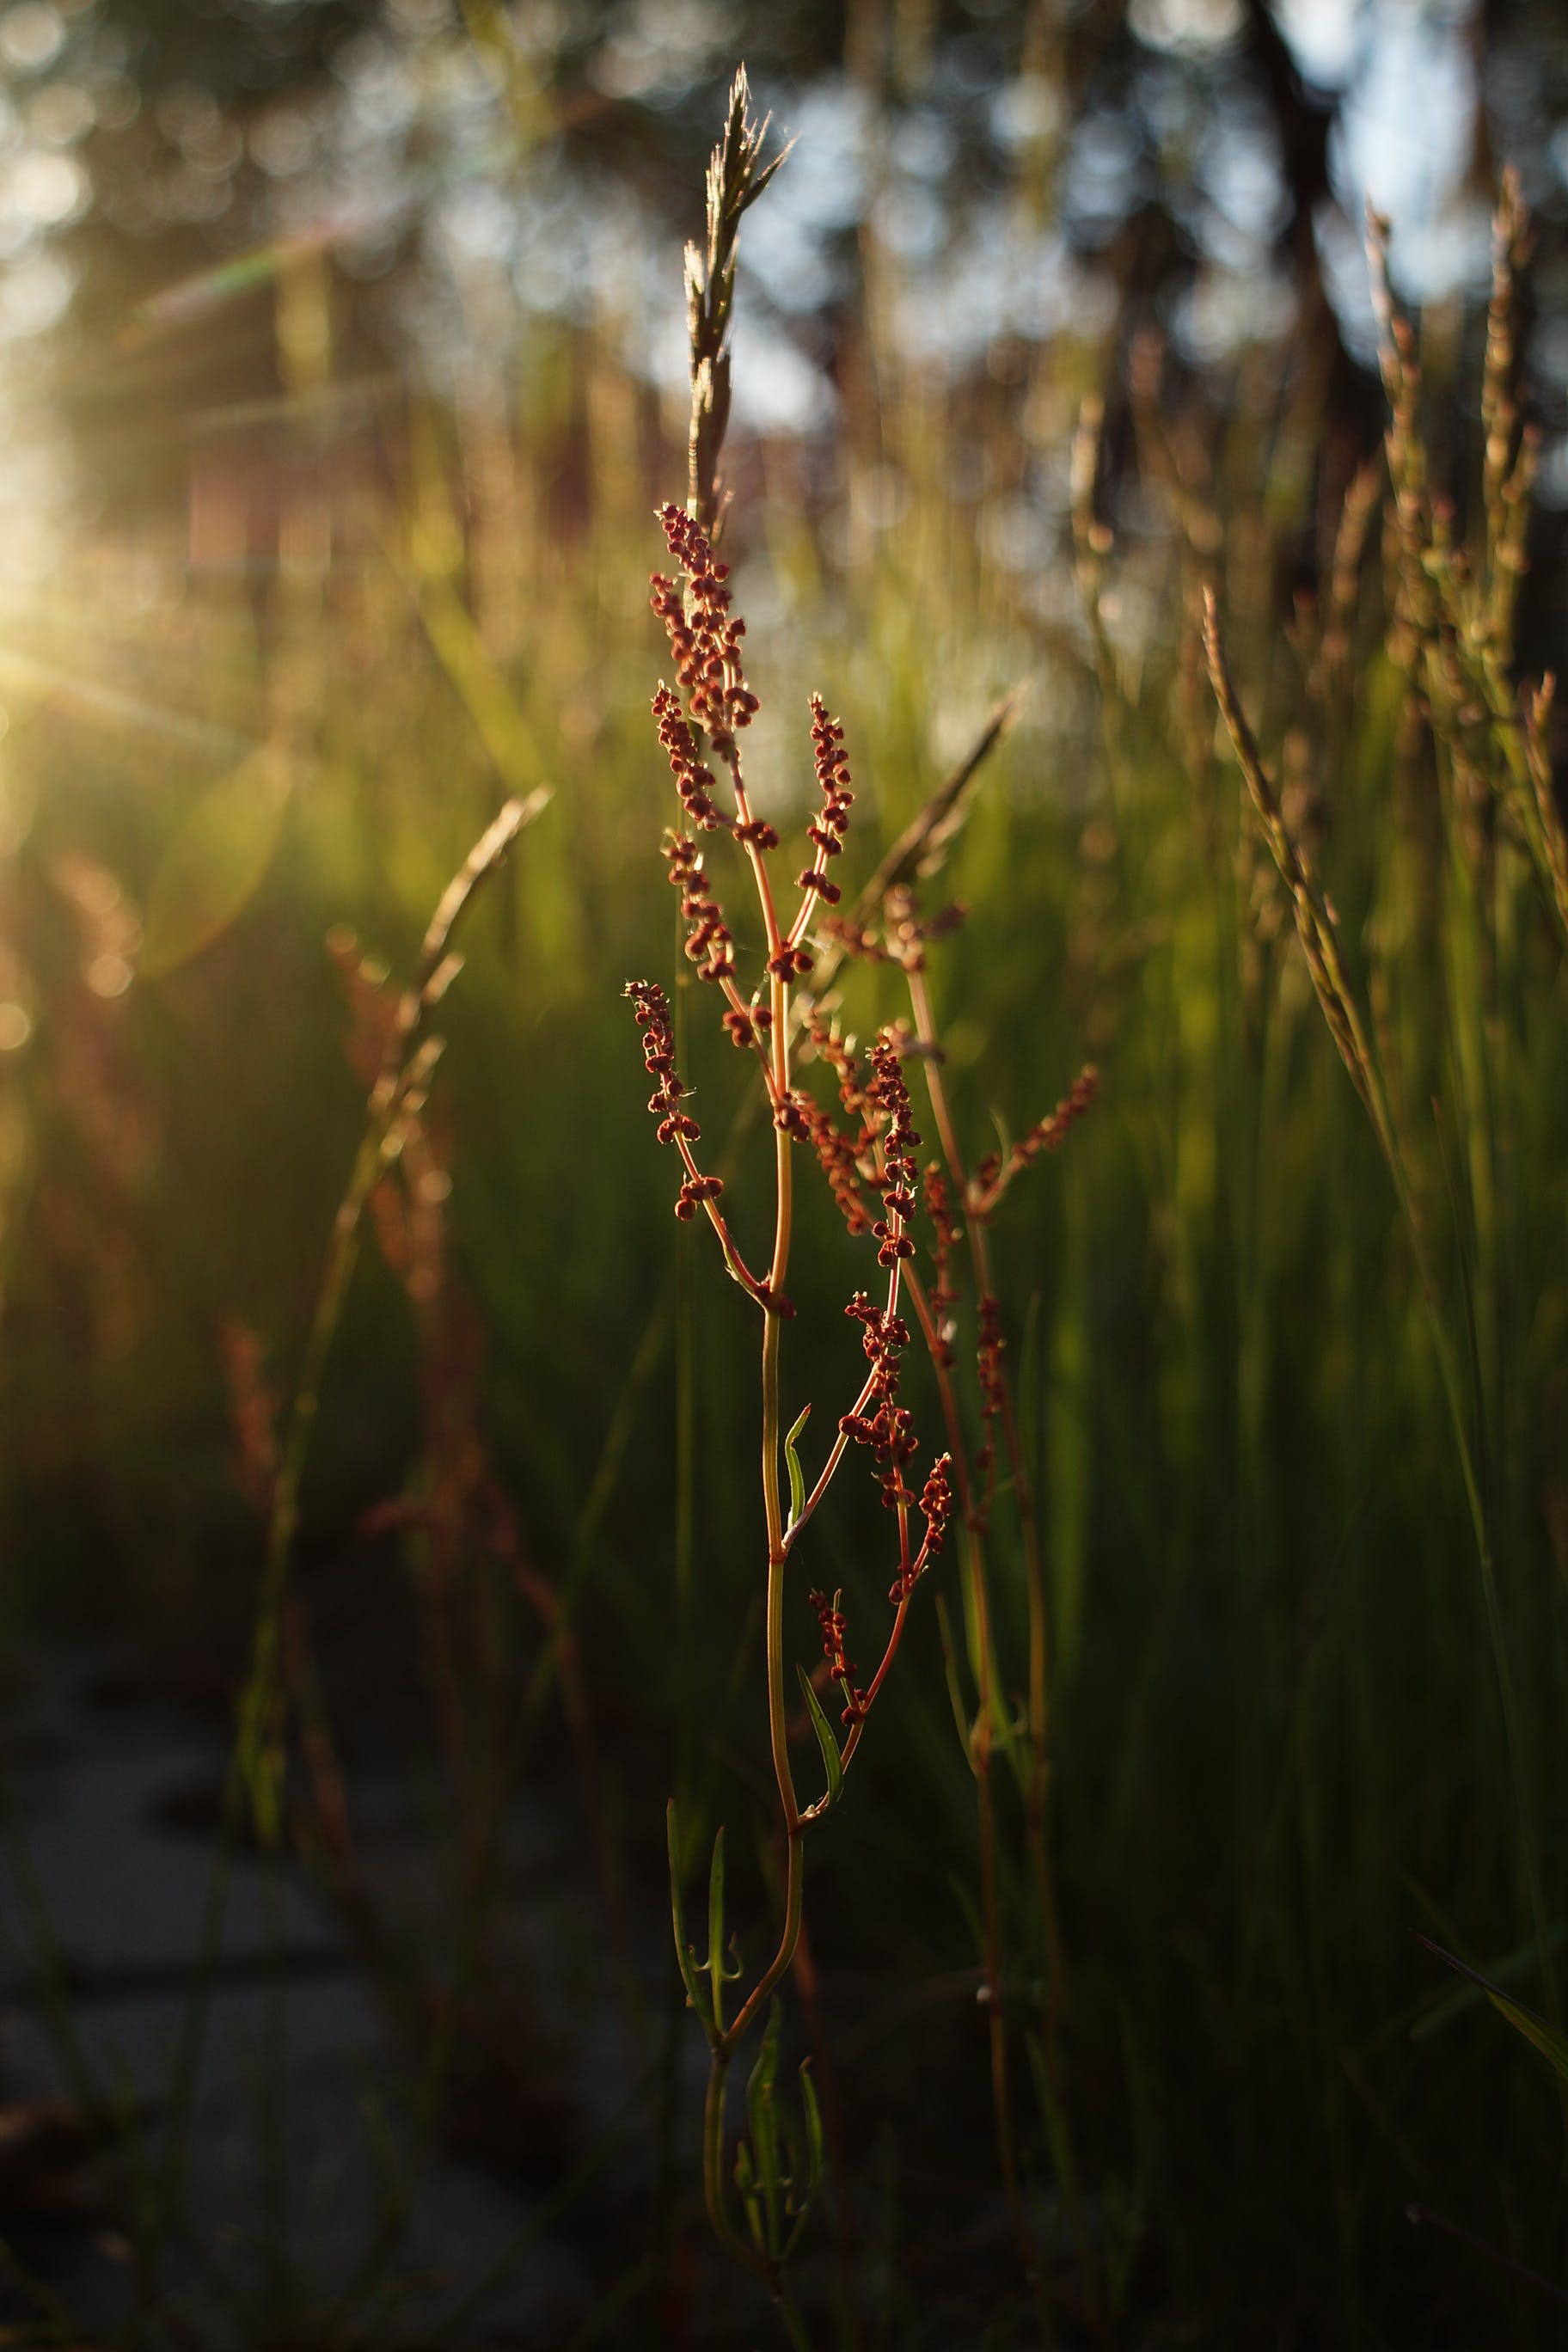 Free stock photo of nature, sunset, grass, plants